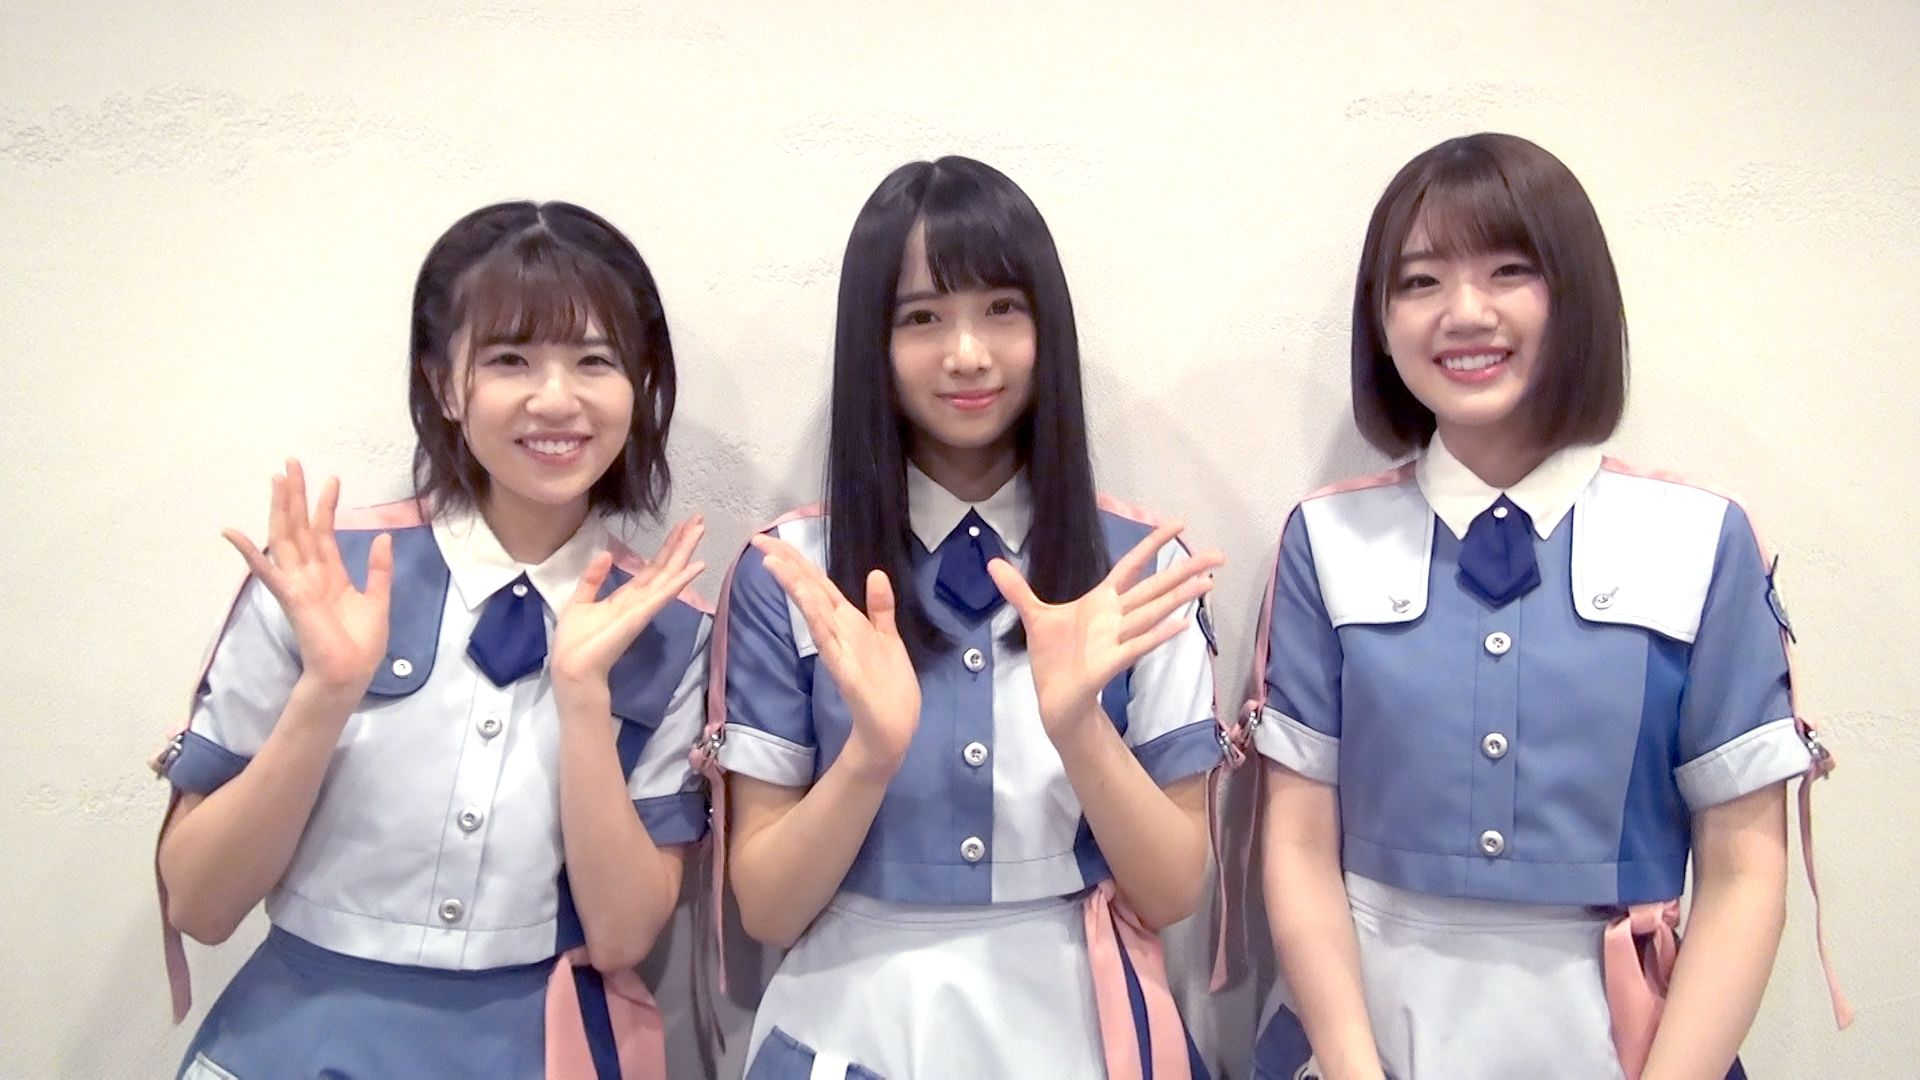 VMAJ2019 記者会見での熱い誓い! 佐々木美玲編